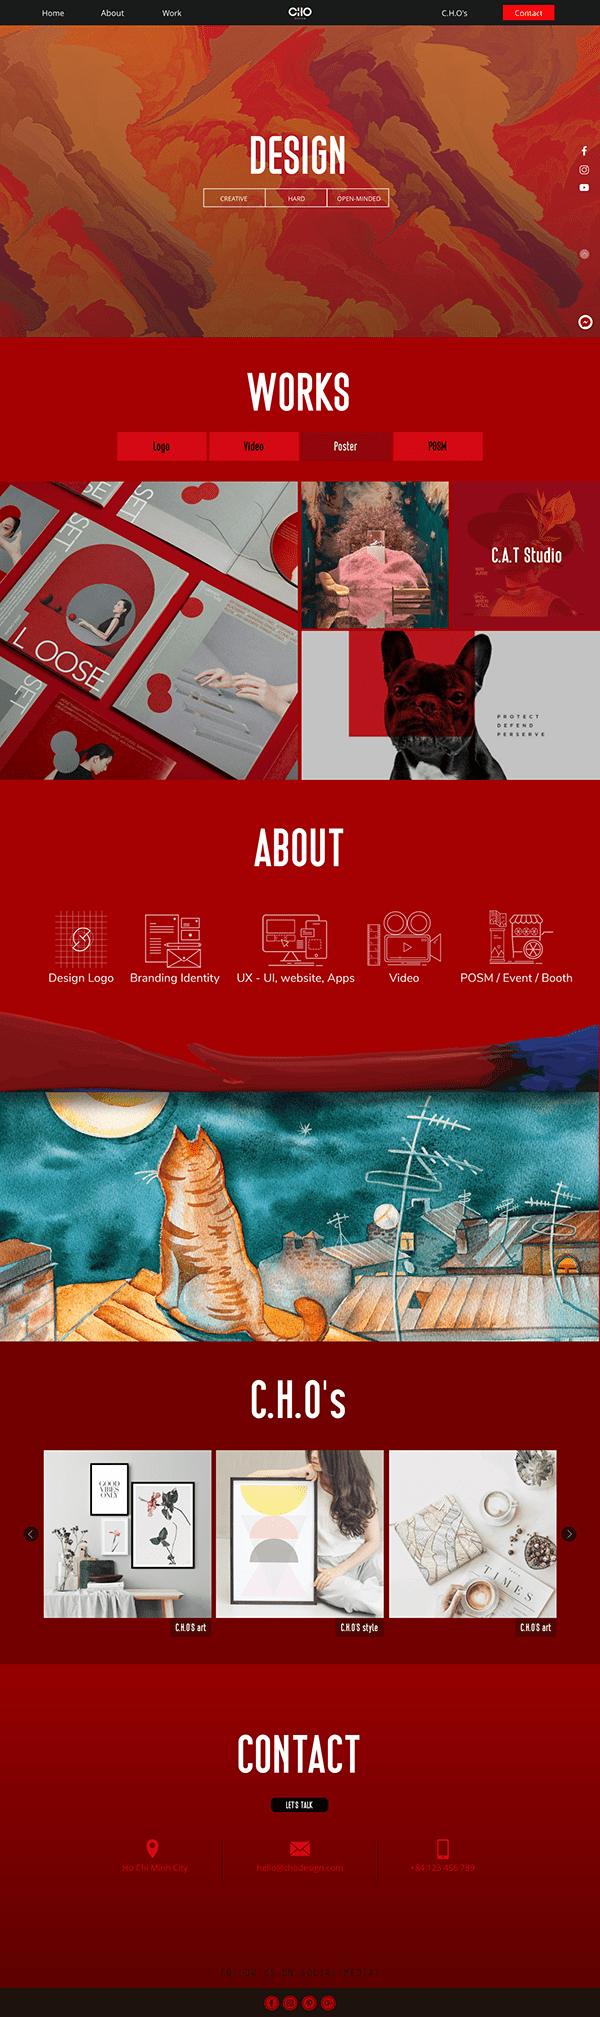 UI Design - Art Website - by Chou